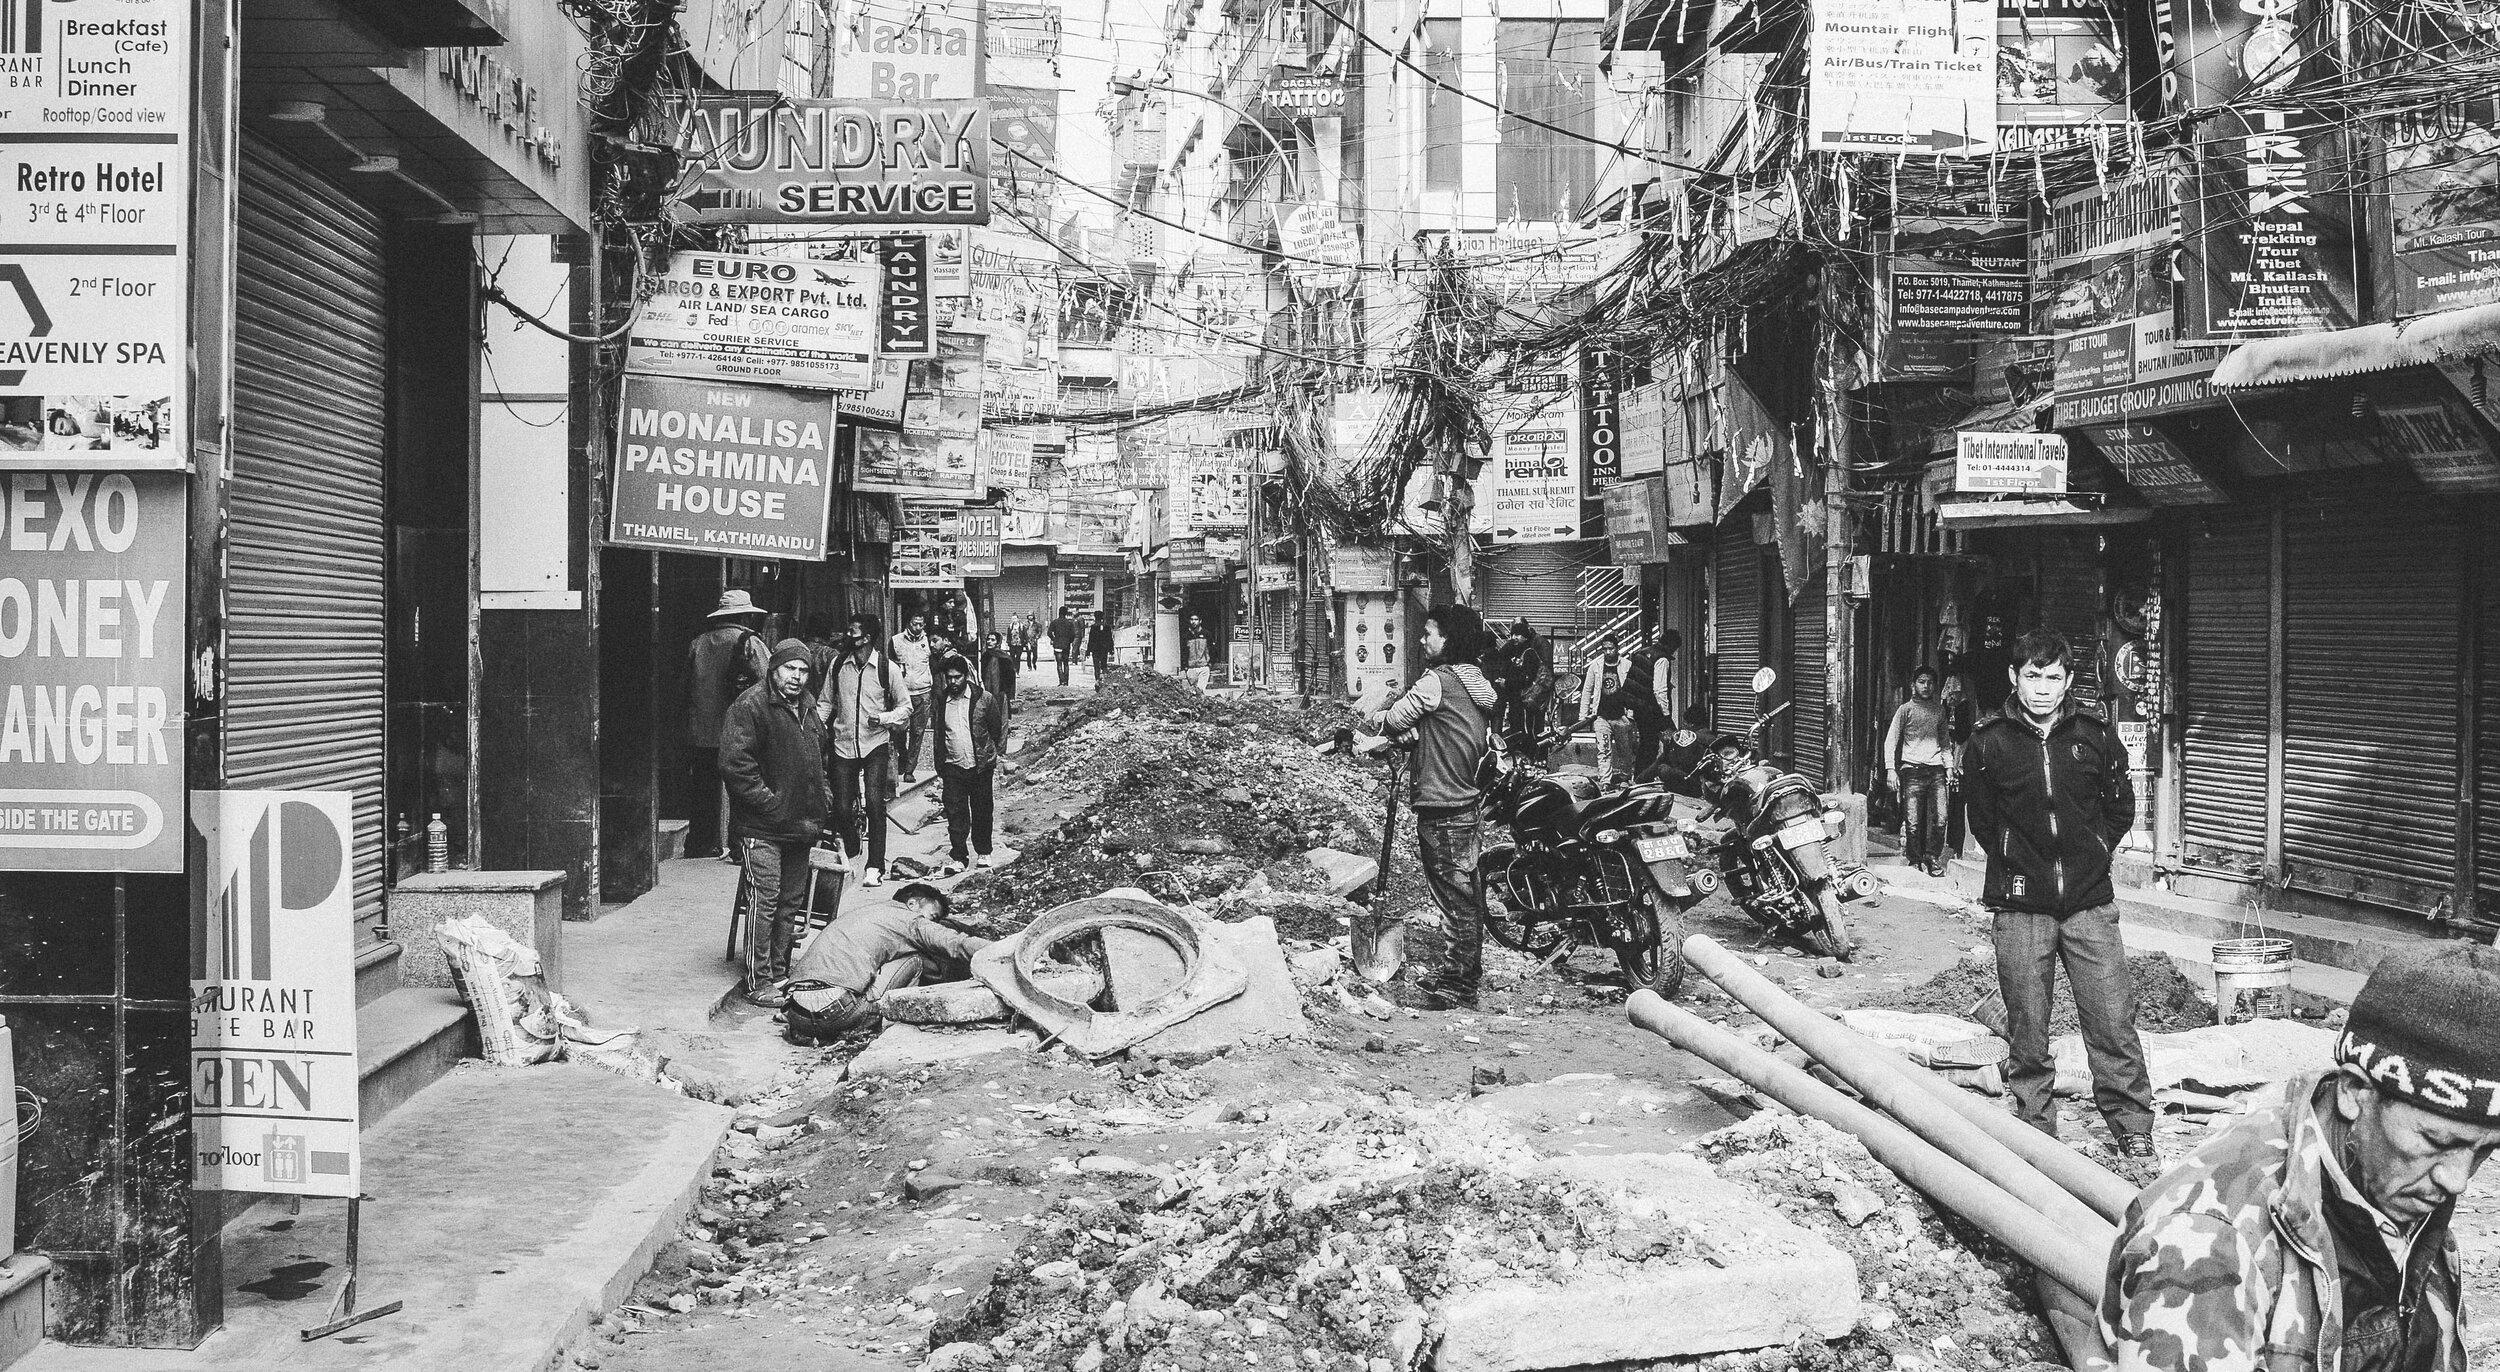 Kathmandu, Nepal, following the destructive earthquake in 2014. • Photo by Adli Wahid